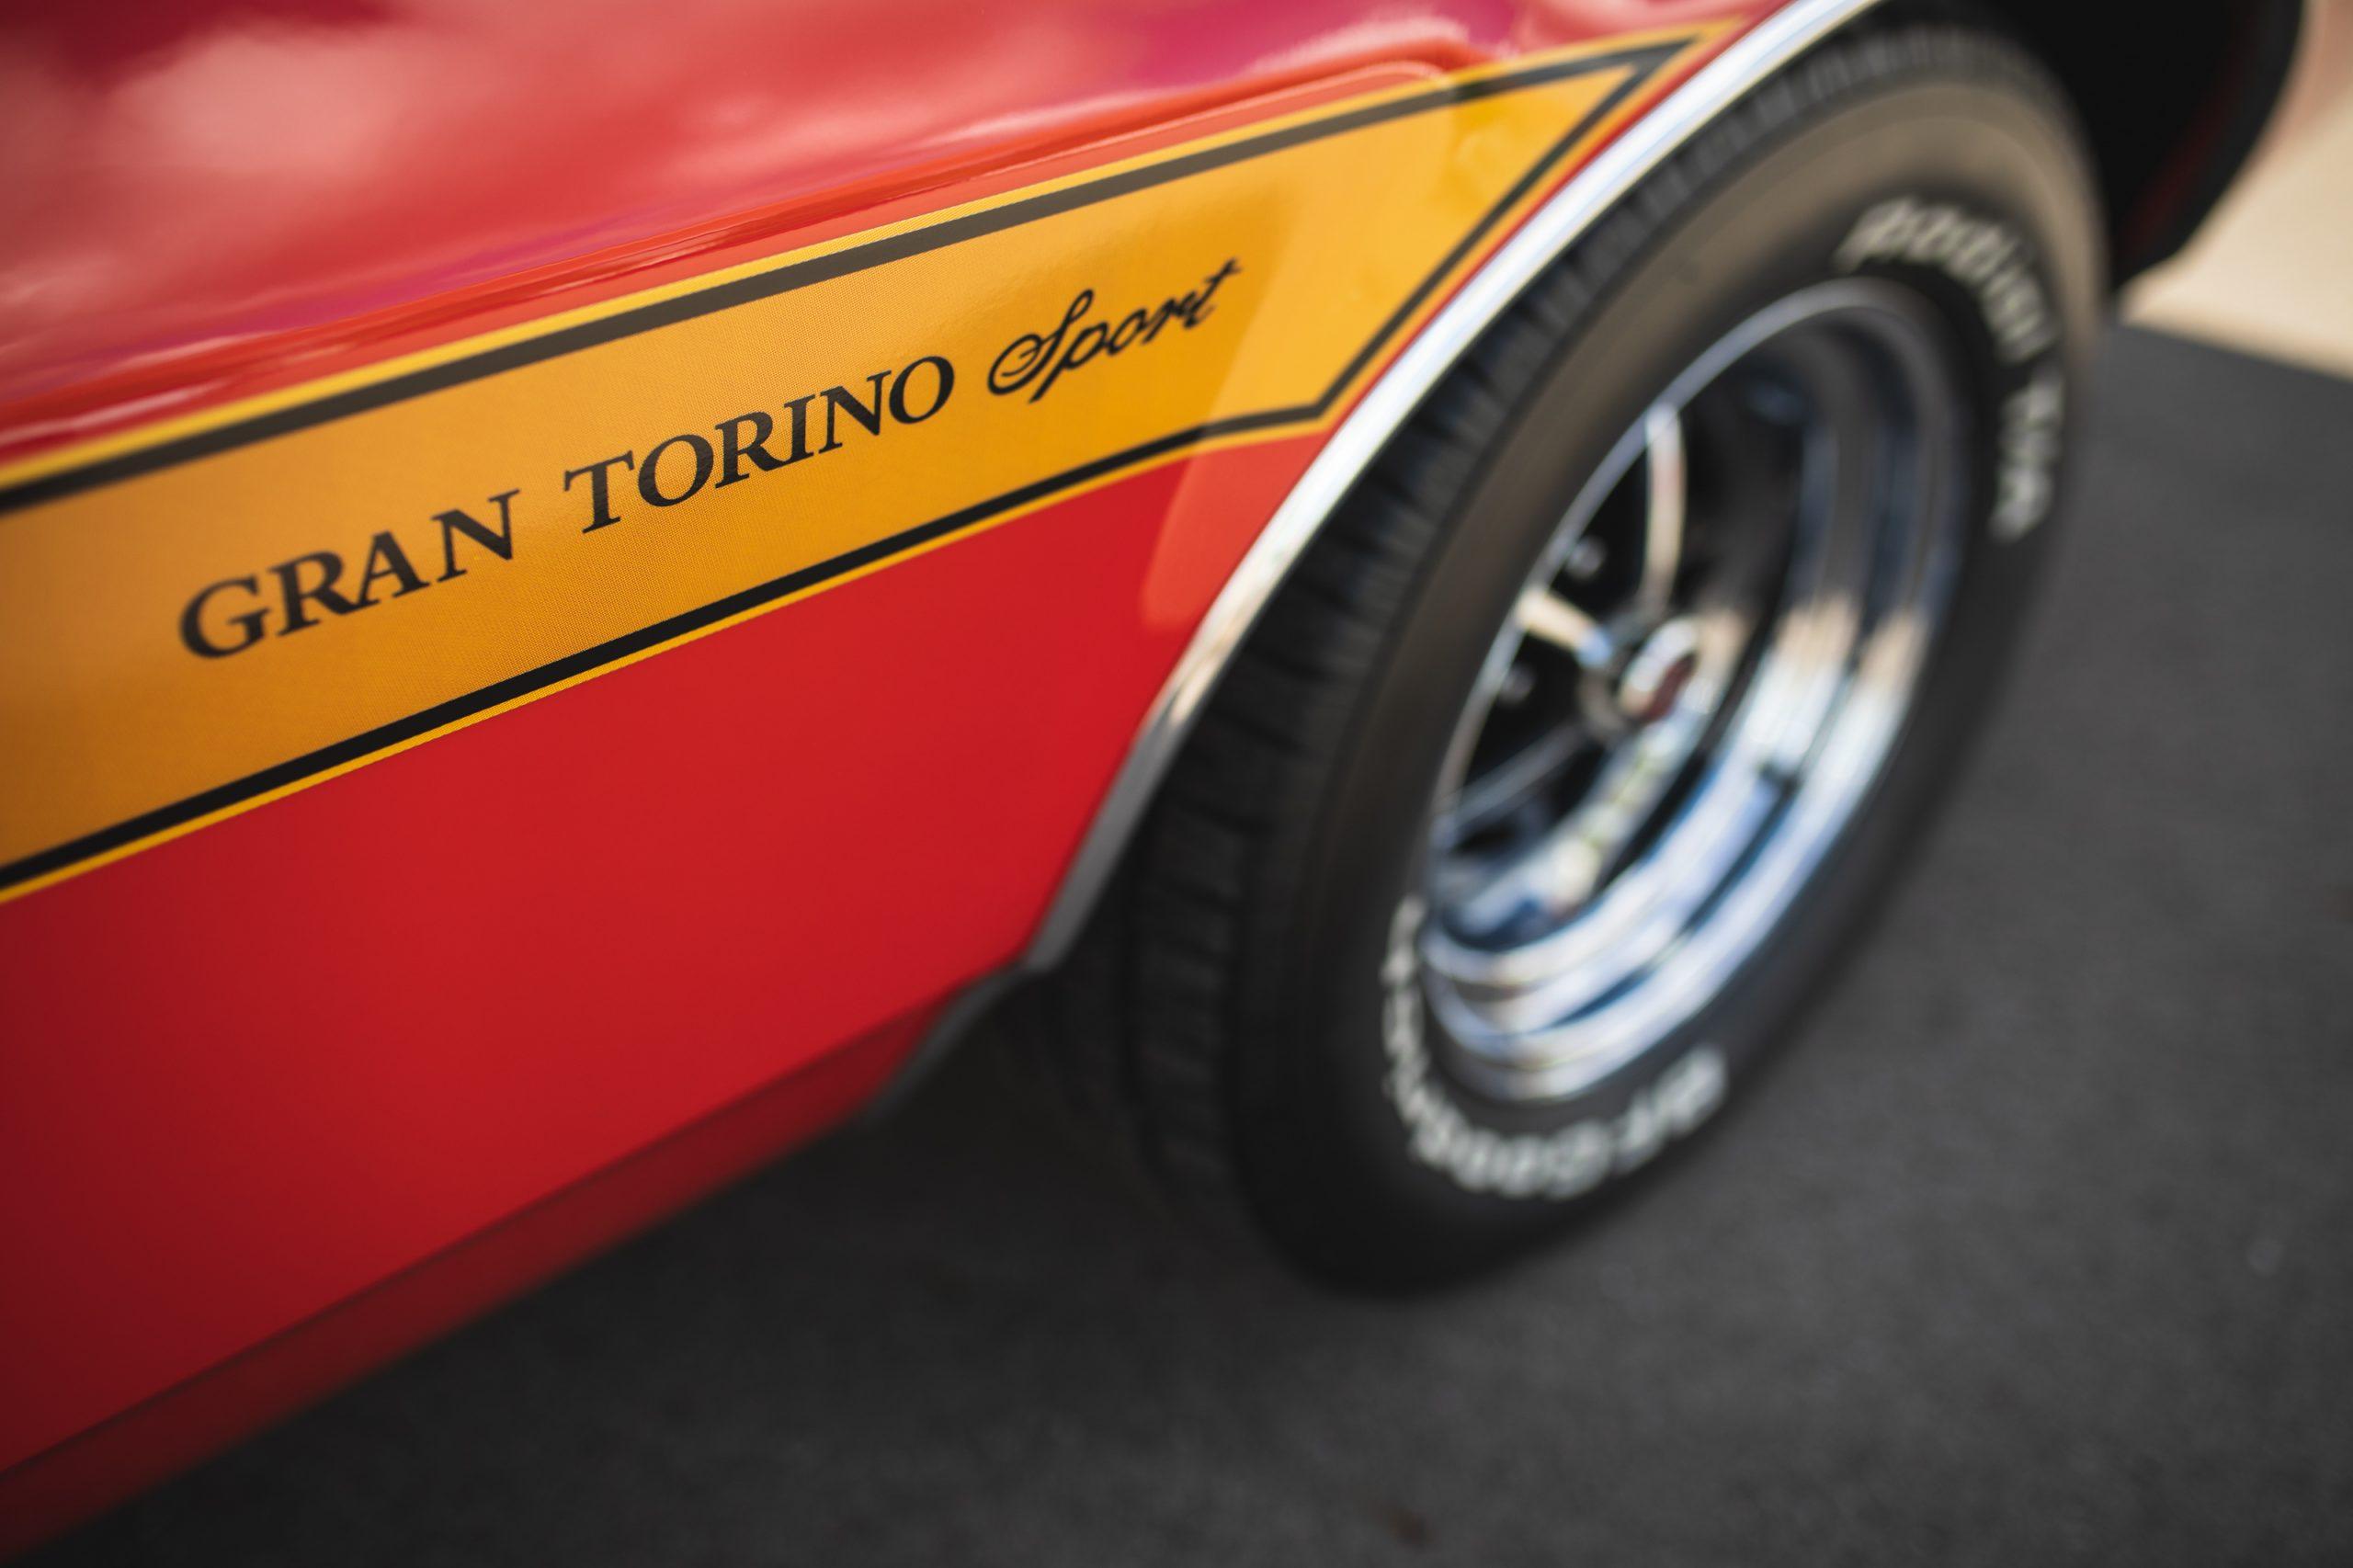 Ford Gran Torino PDC closing car show